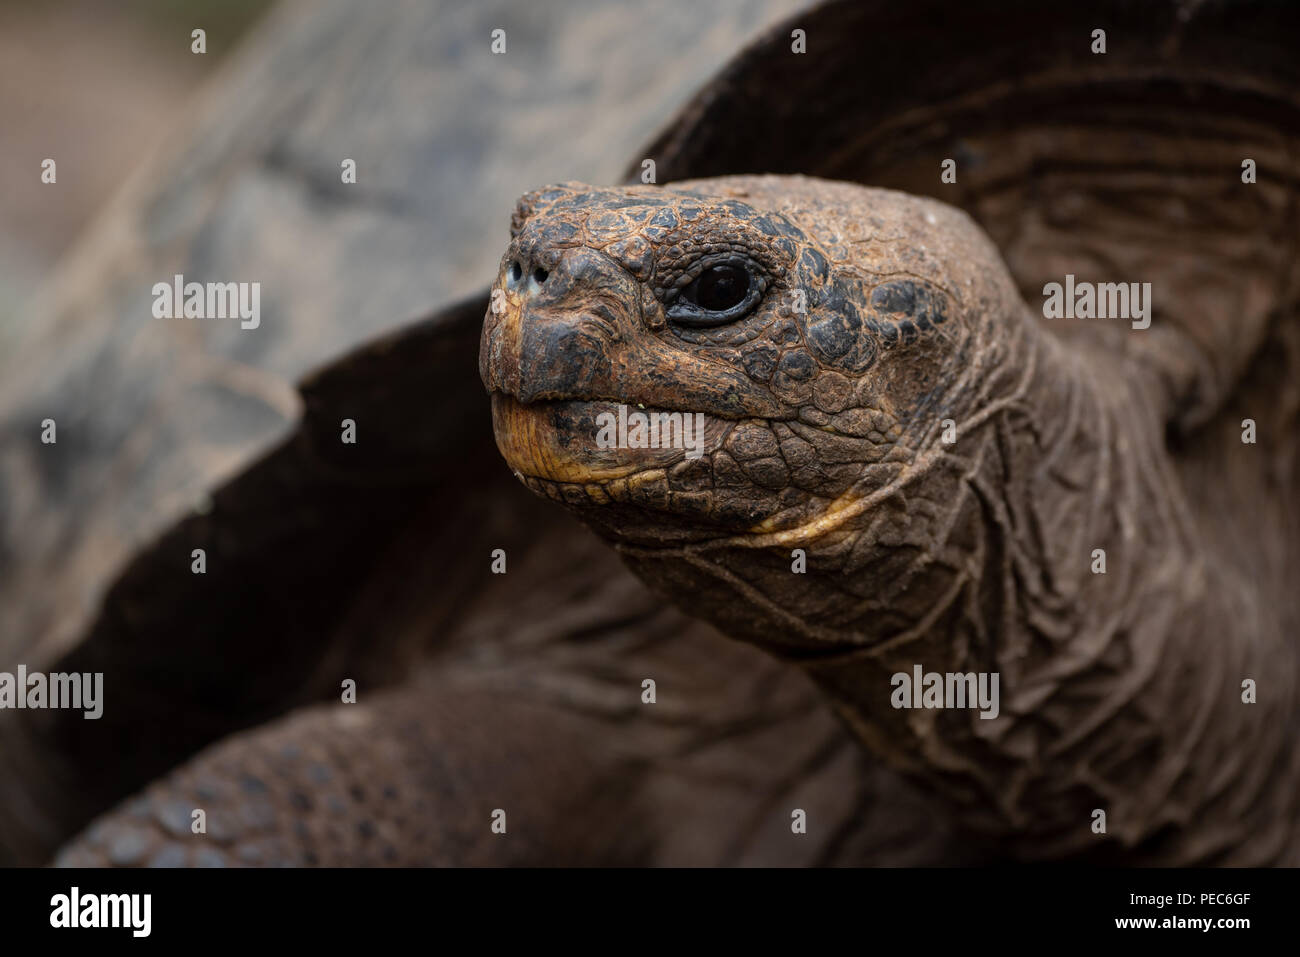 Giant Tortoise, Galápagos - Stock Image